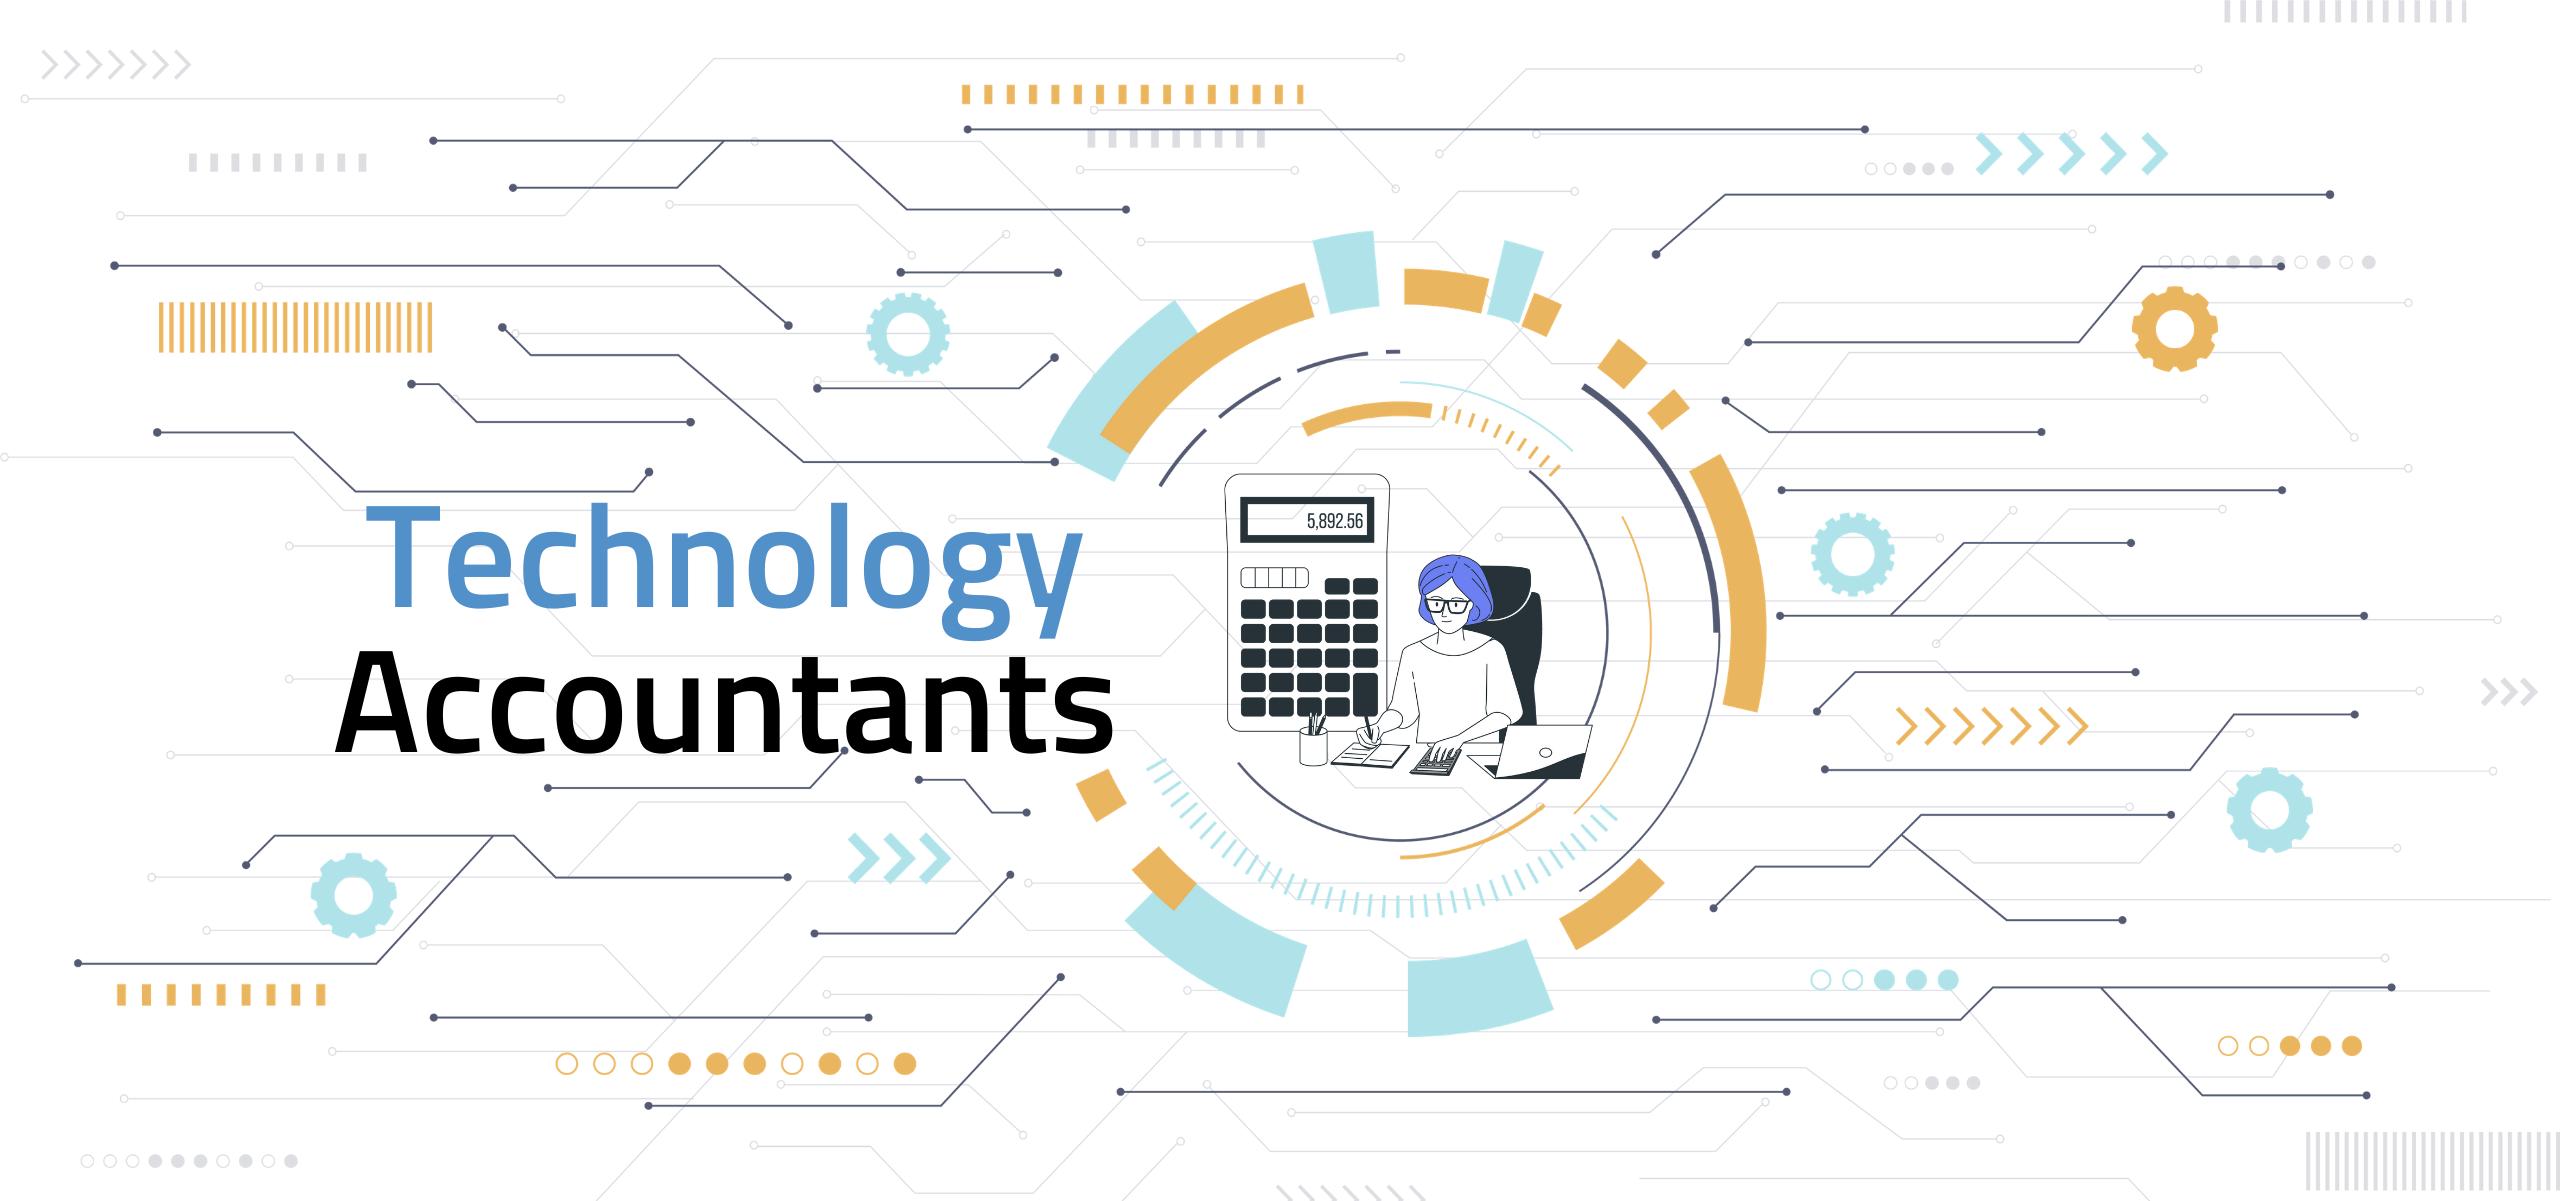 Technology Accountants